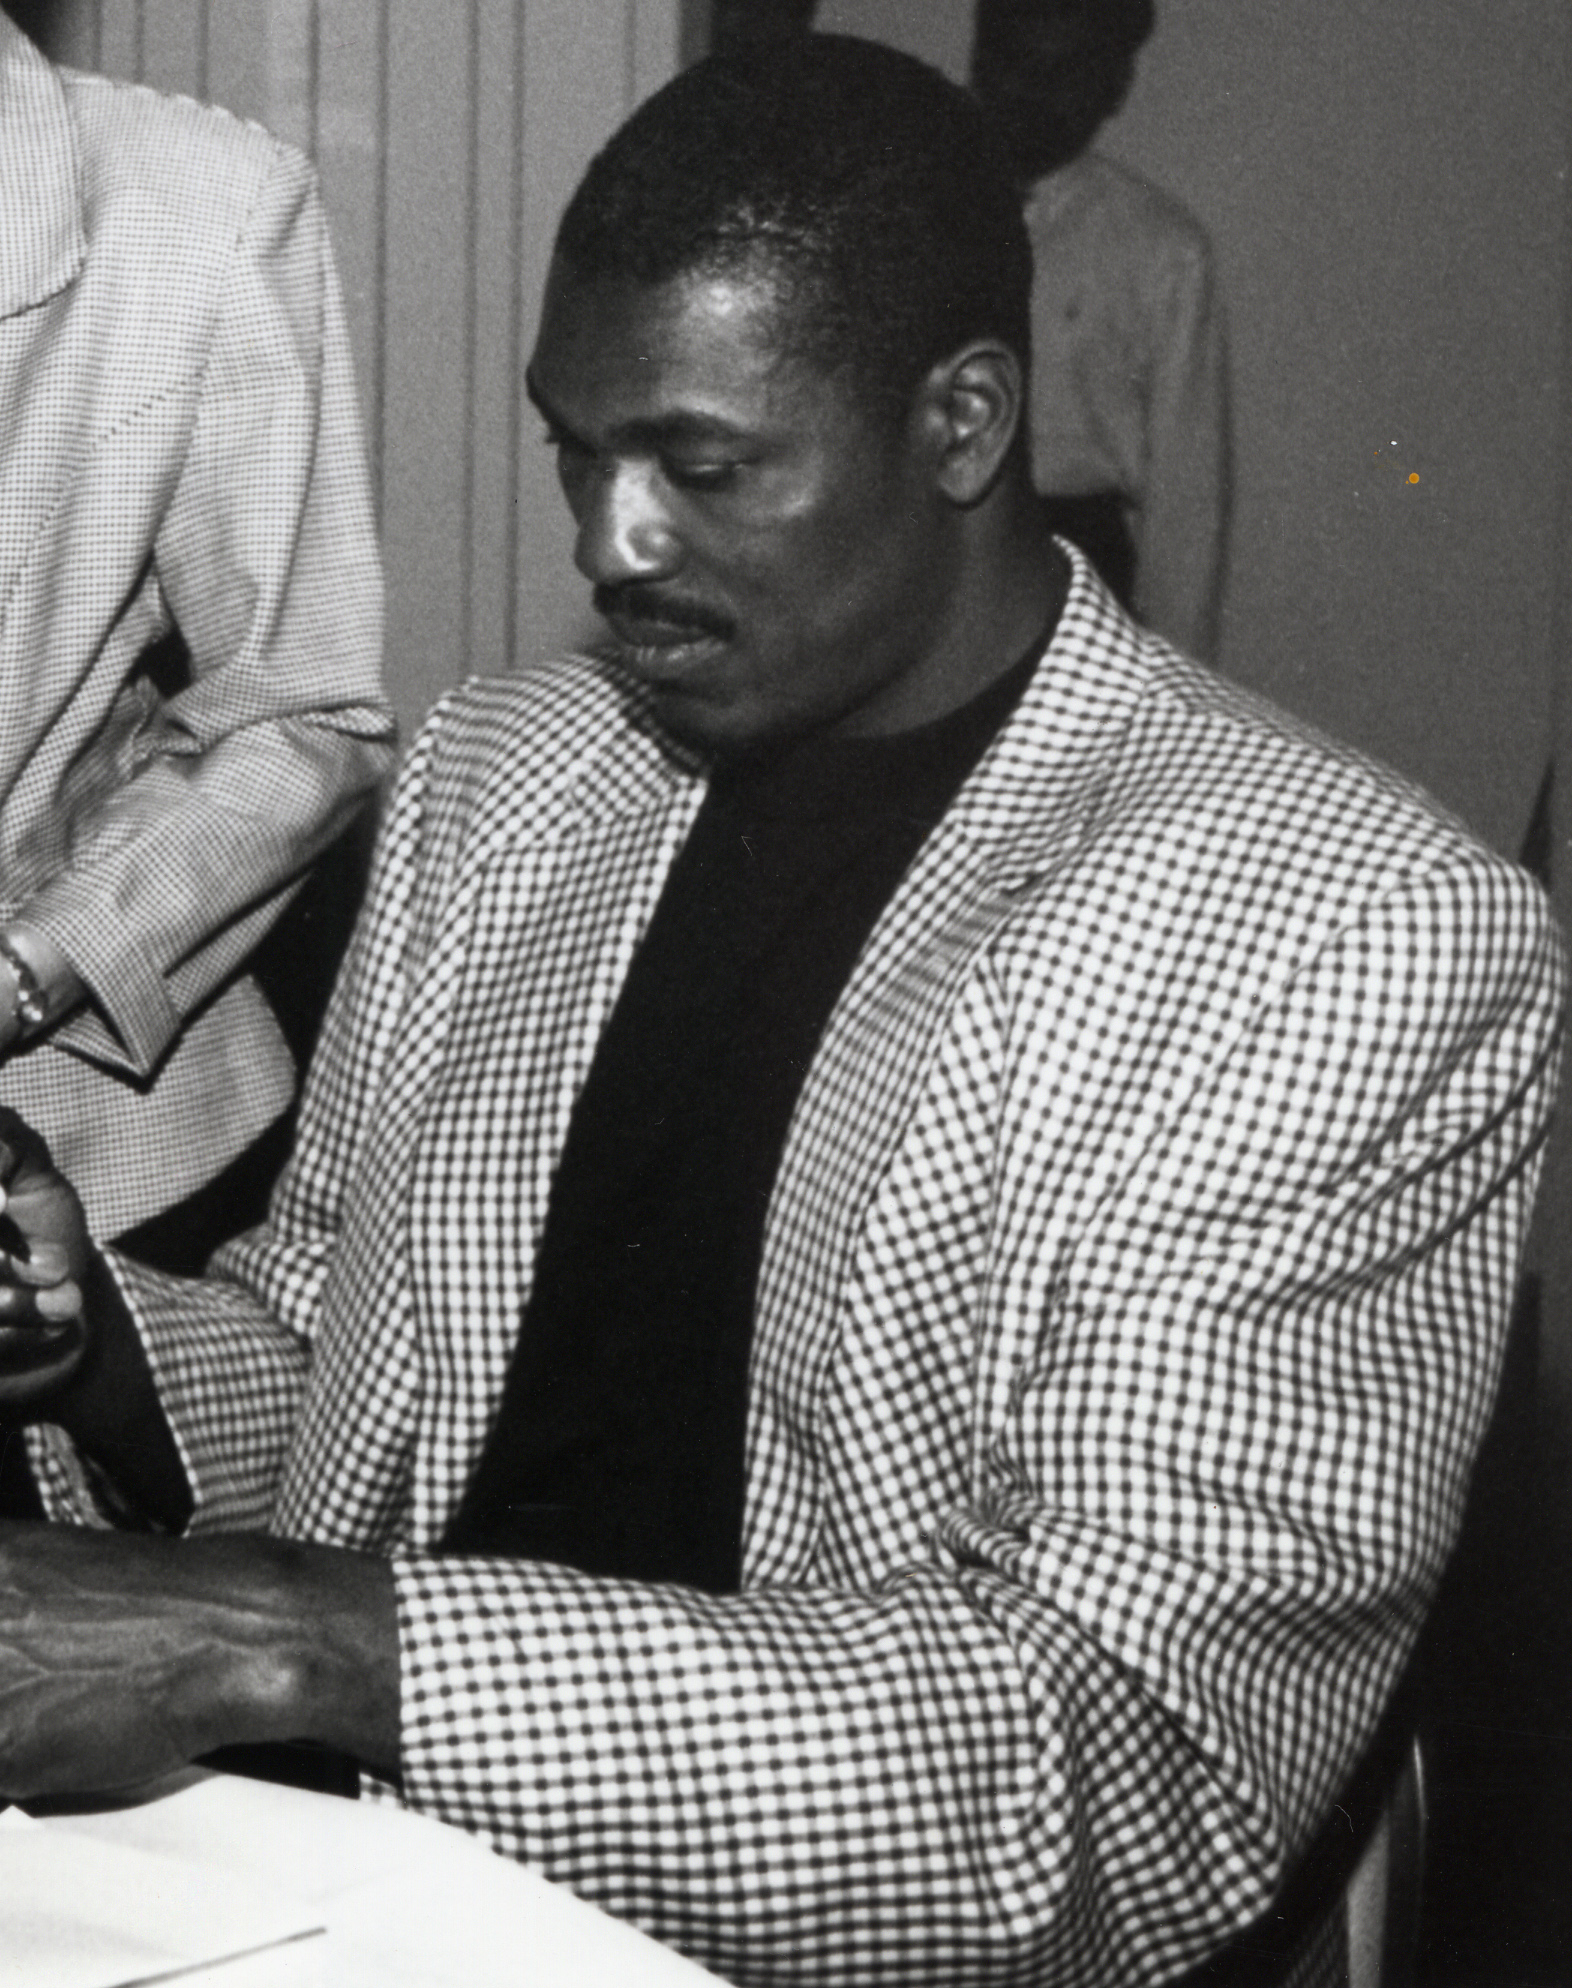 Hakeem Abdul Olajuwon